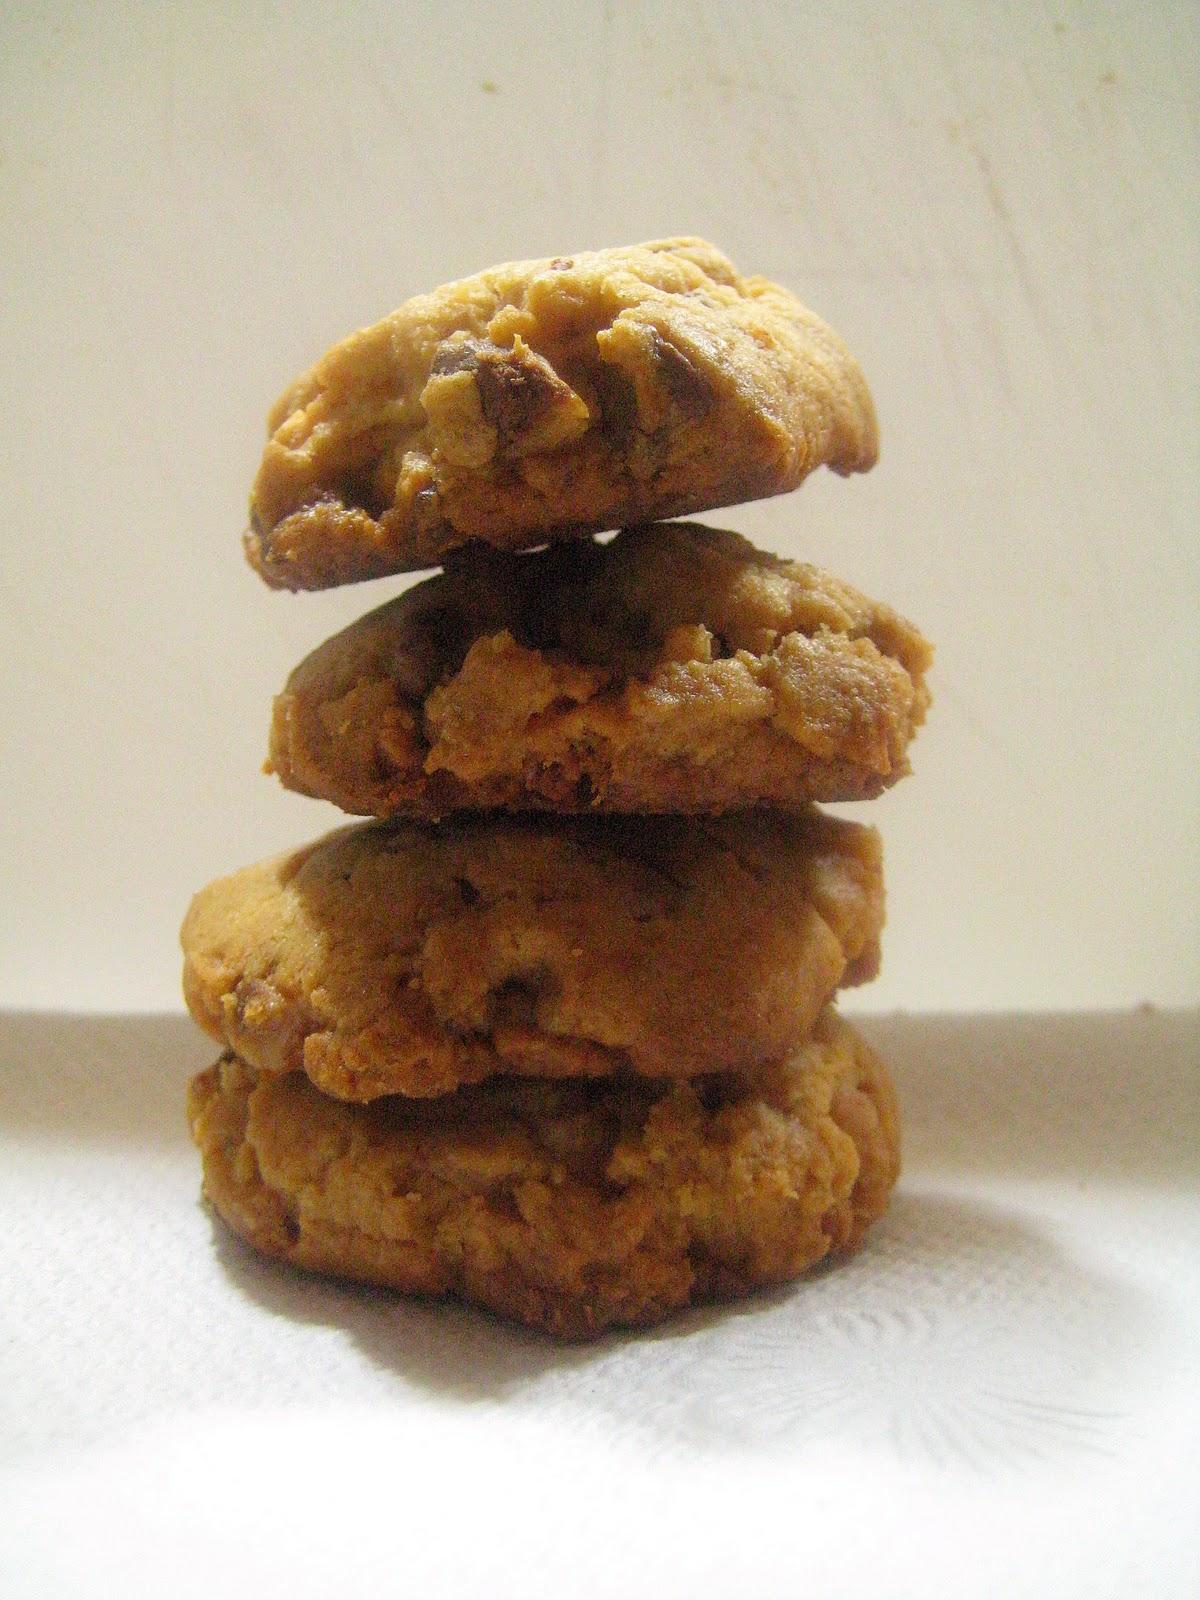 Bitchin' Kitchen: Peanut Butter Toffee Cookies